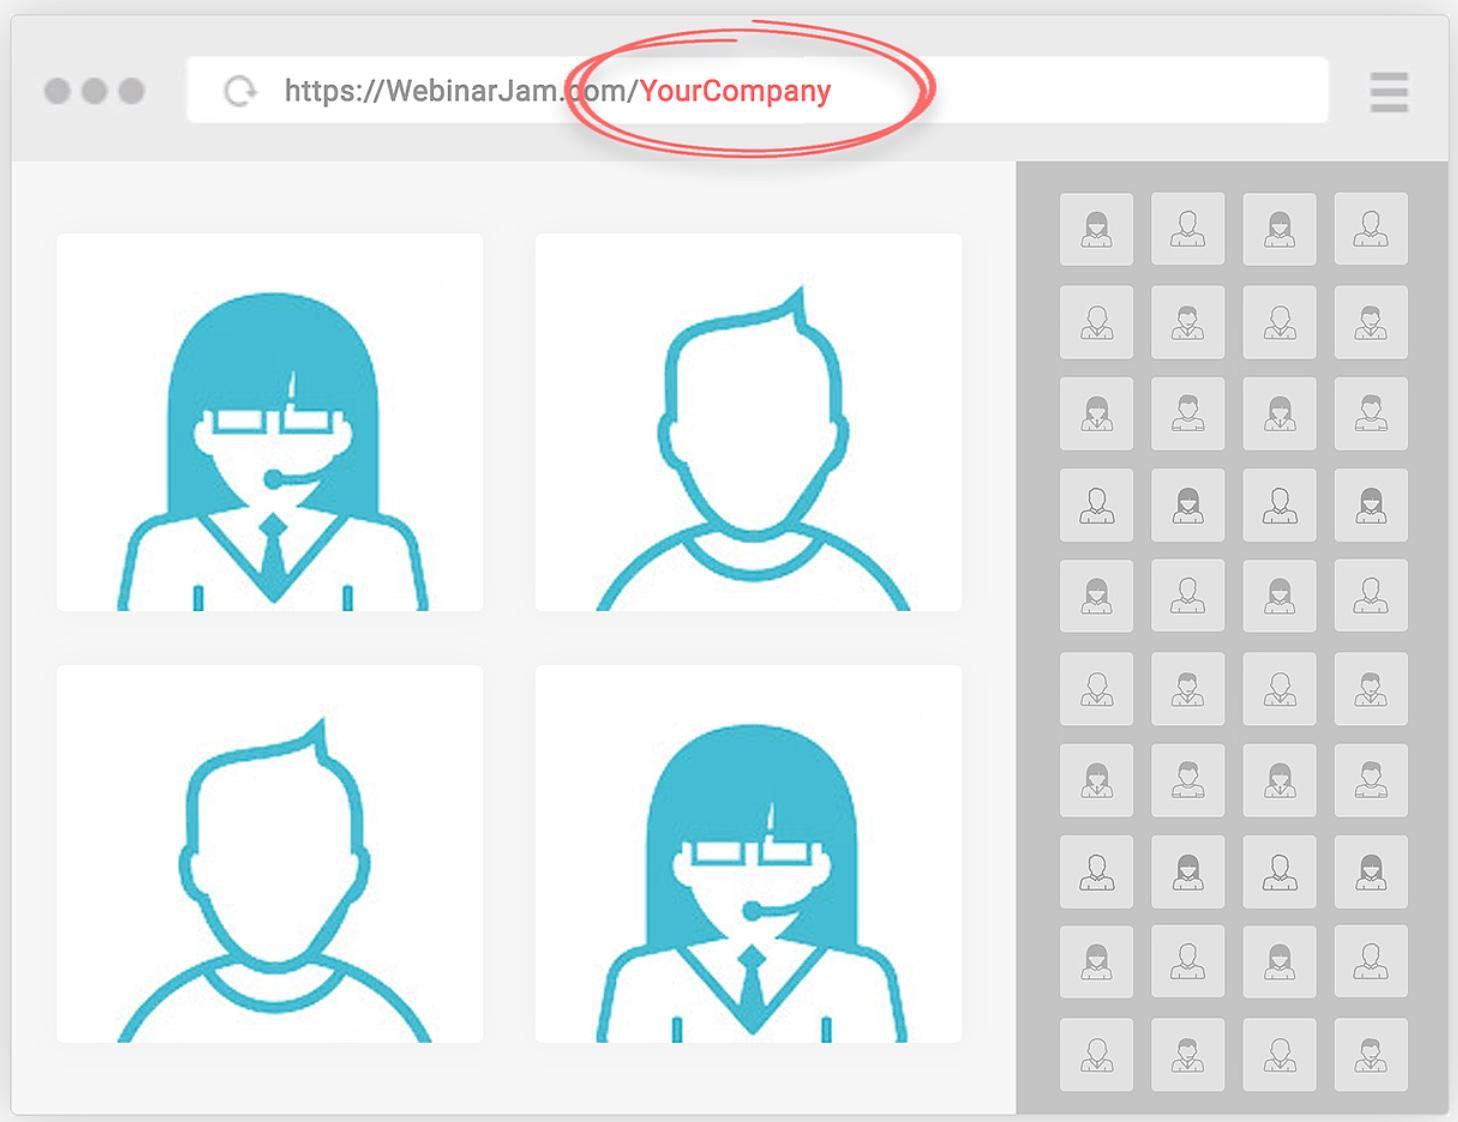 WebinarJam Webinar Customization Options